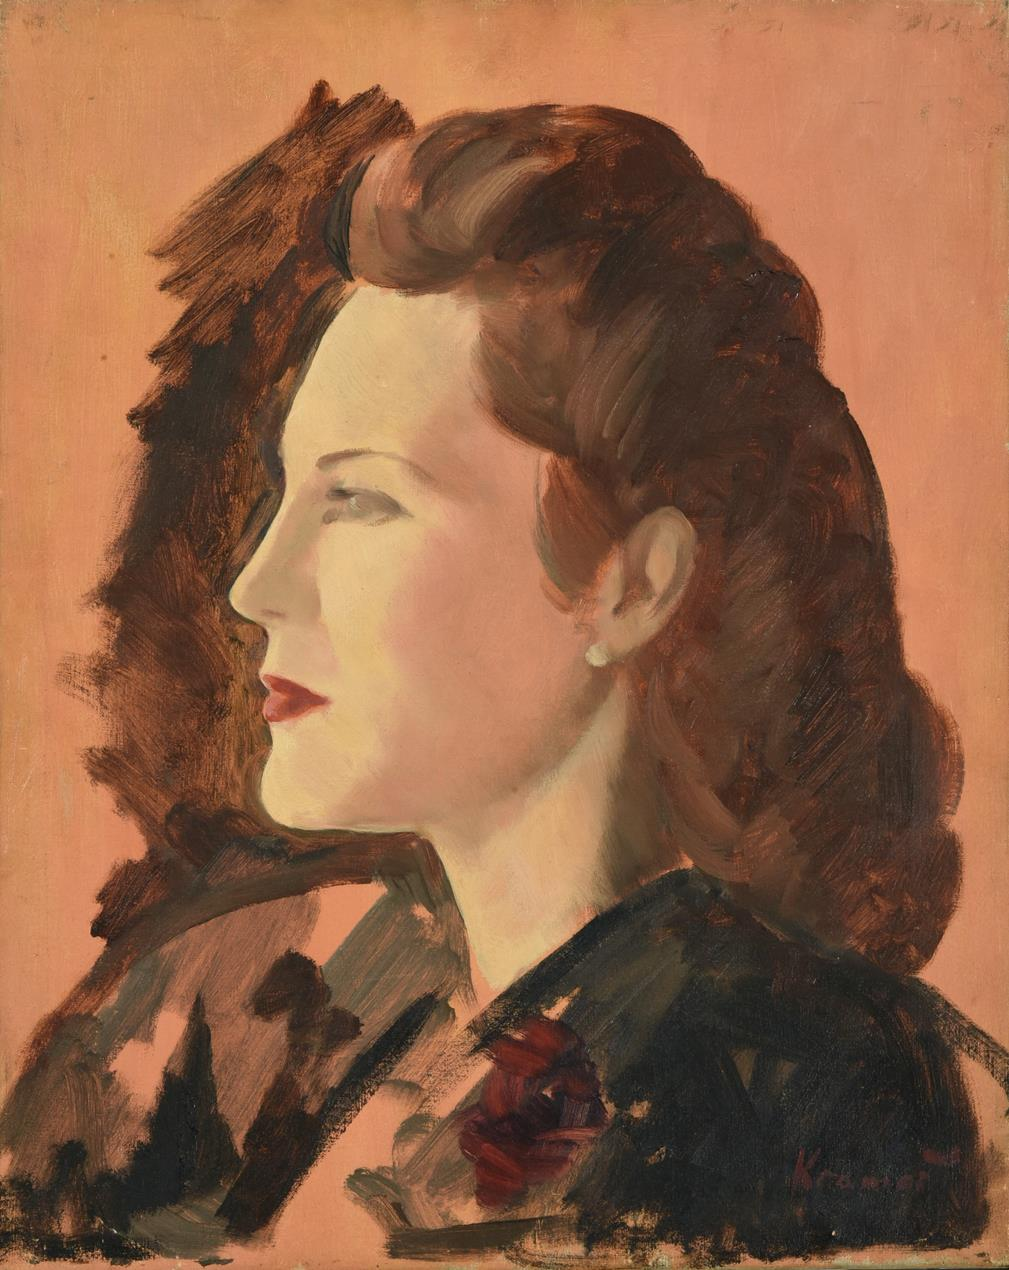 Jacob Kramer (1892-1962) ''Miss Joyce Heron'', head and shoulders portrait sketch in profile Signed,